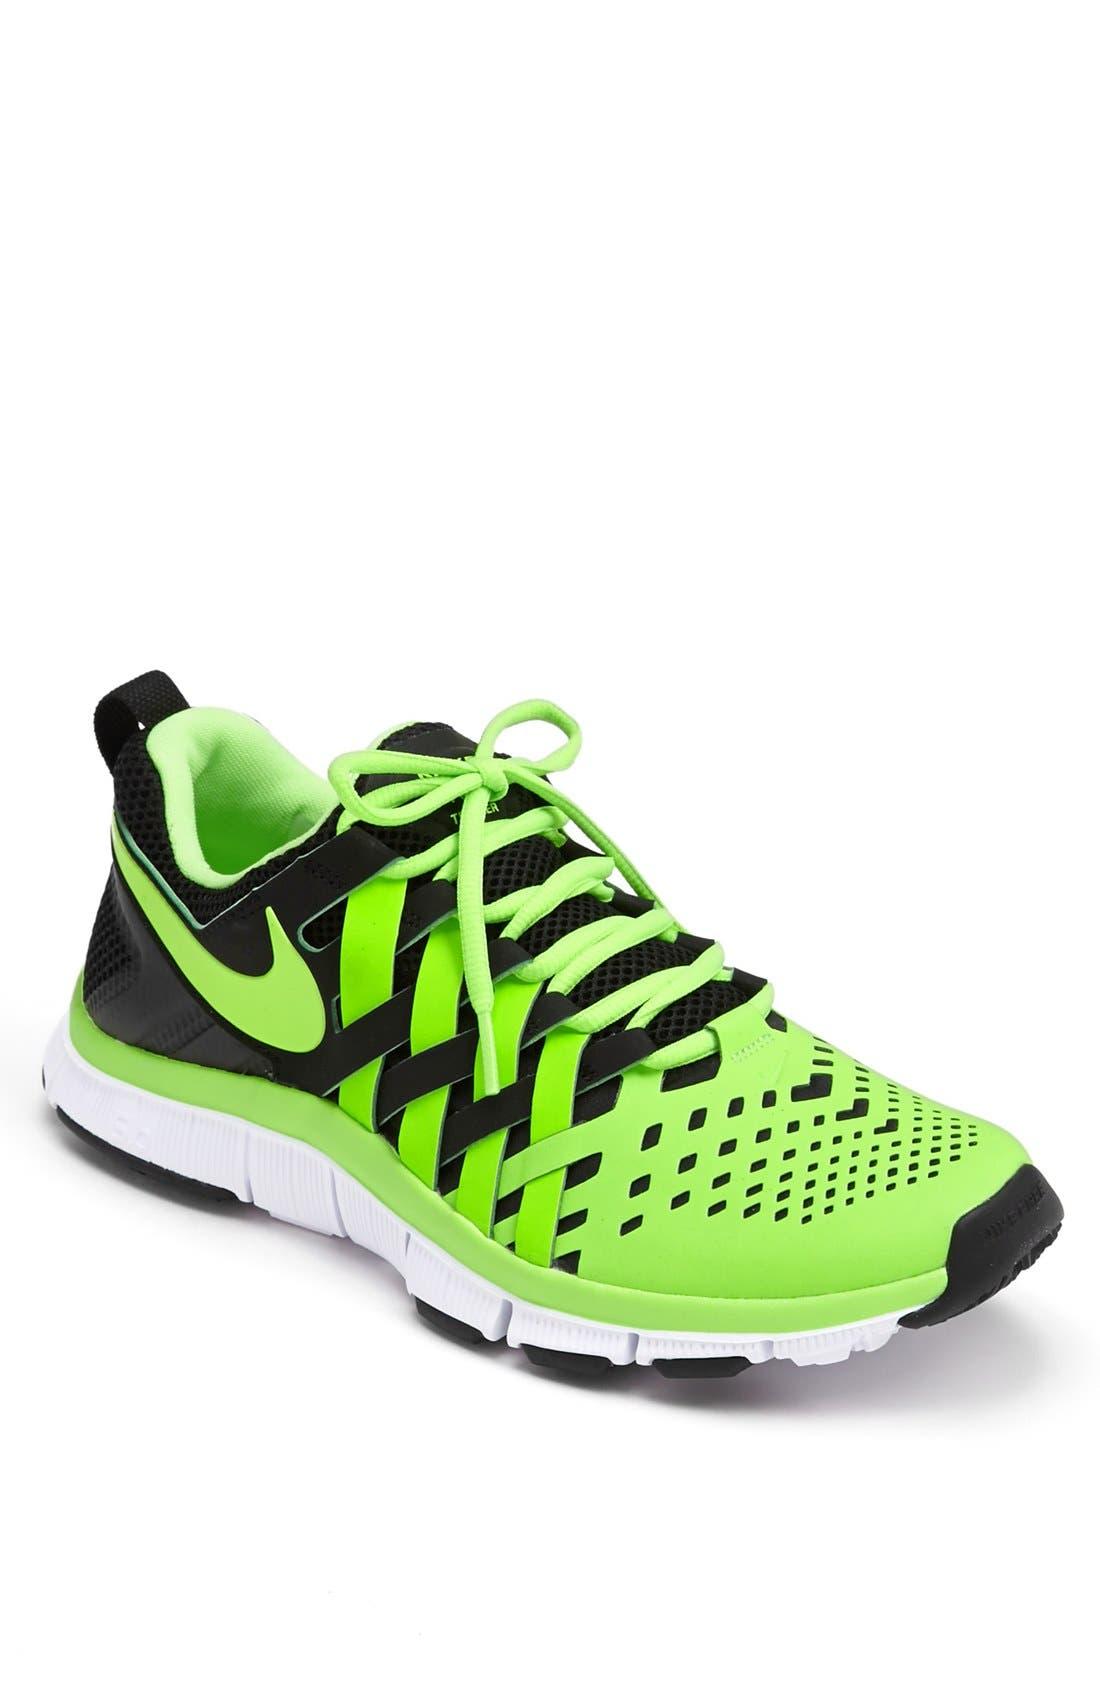 Main Image - Nike 'Free Trainer 5.0' Training Shoe (Men)